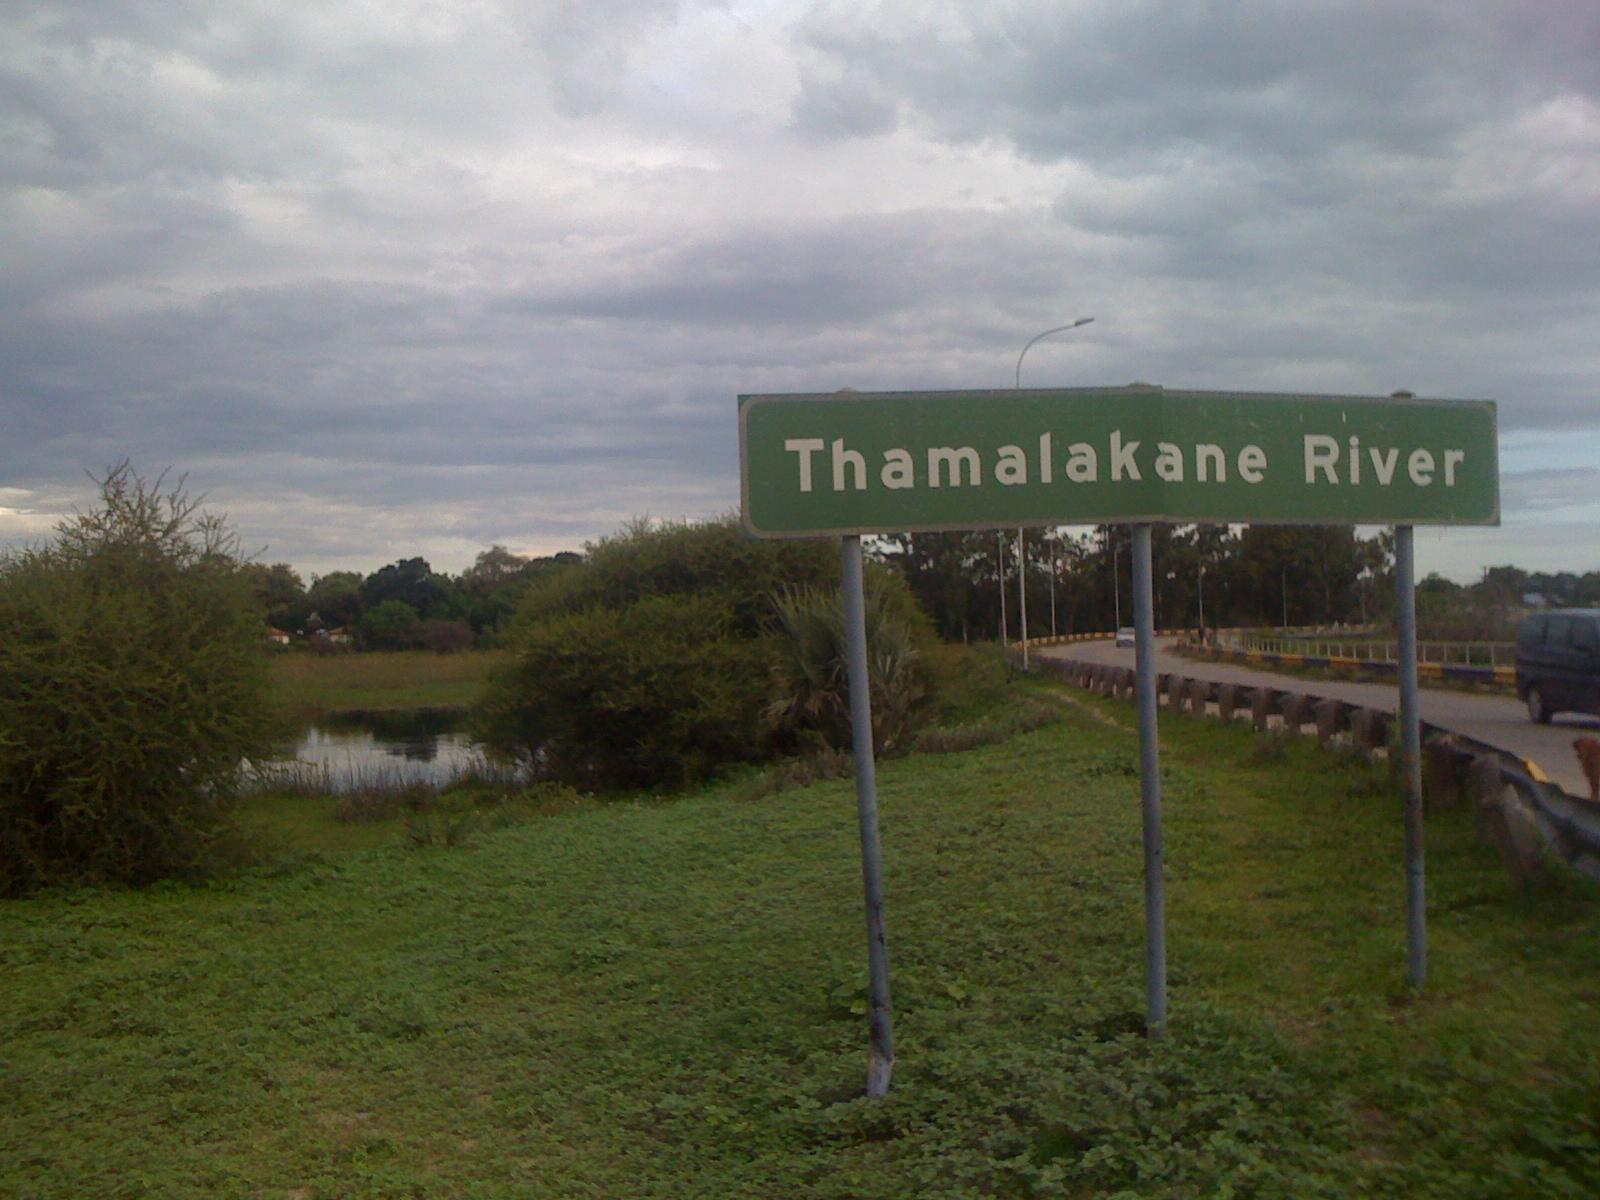 Thamalakane River